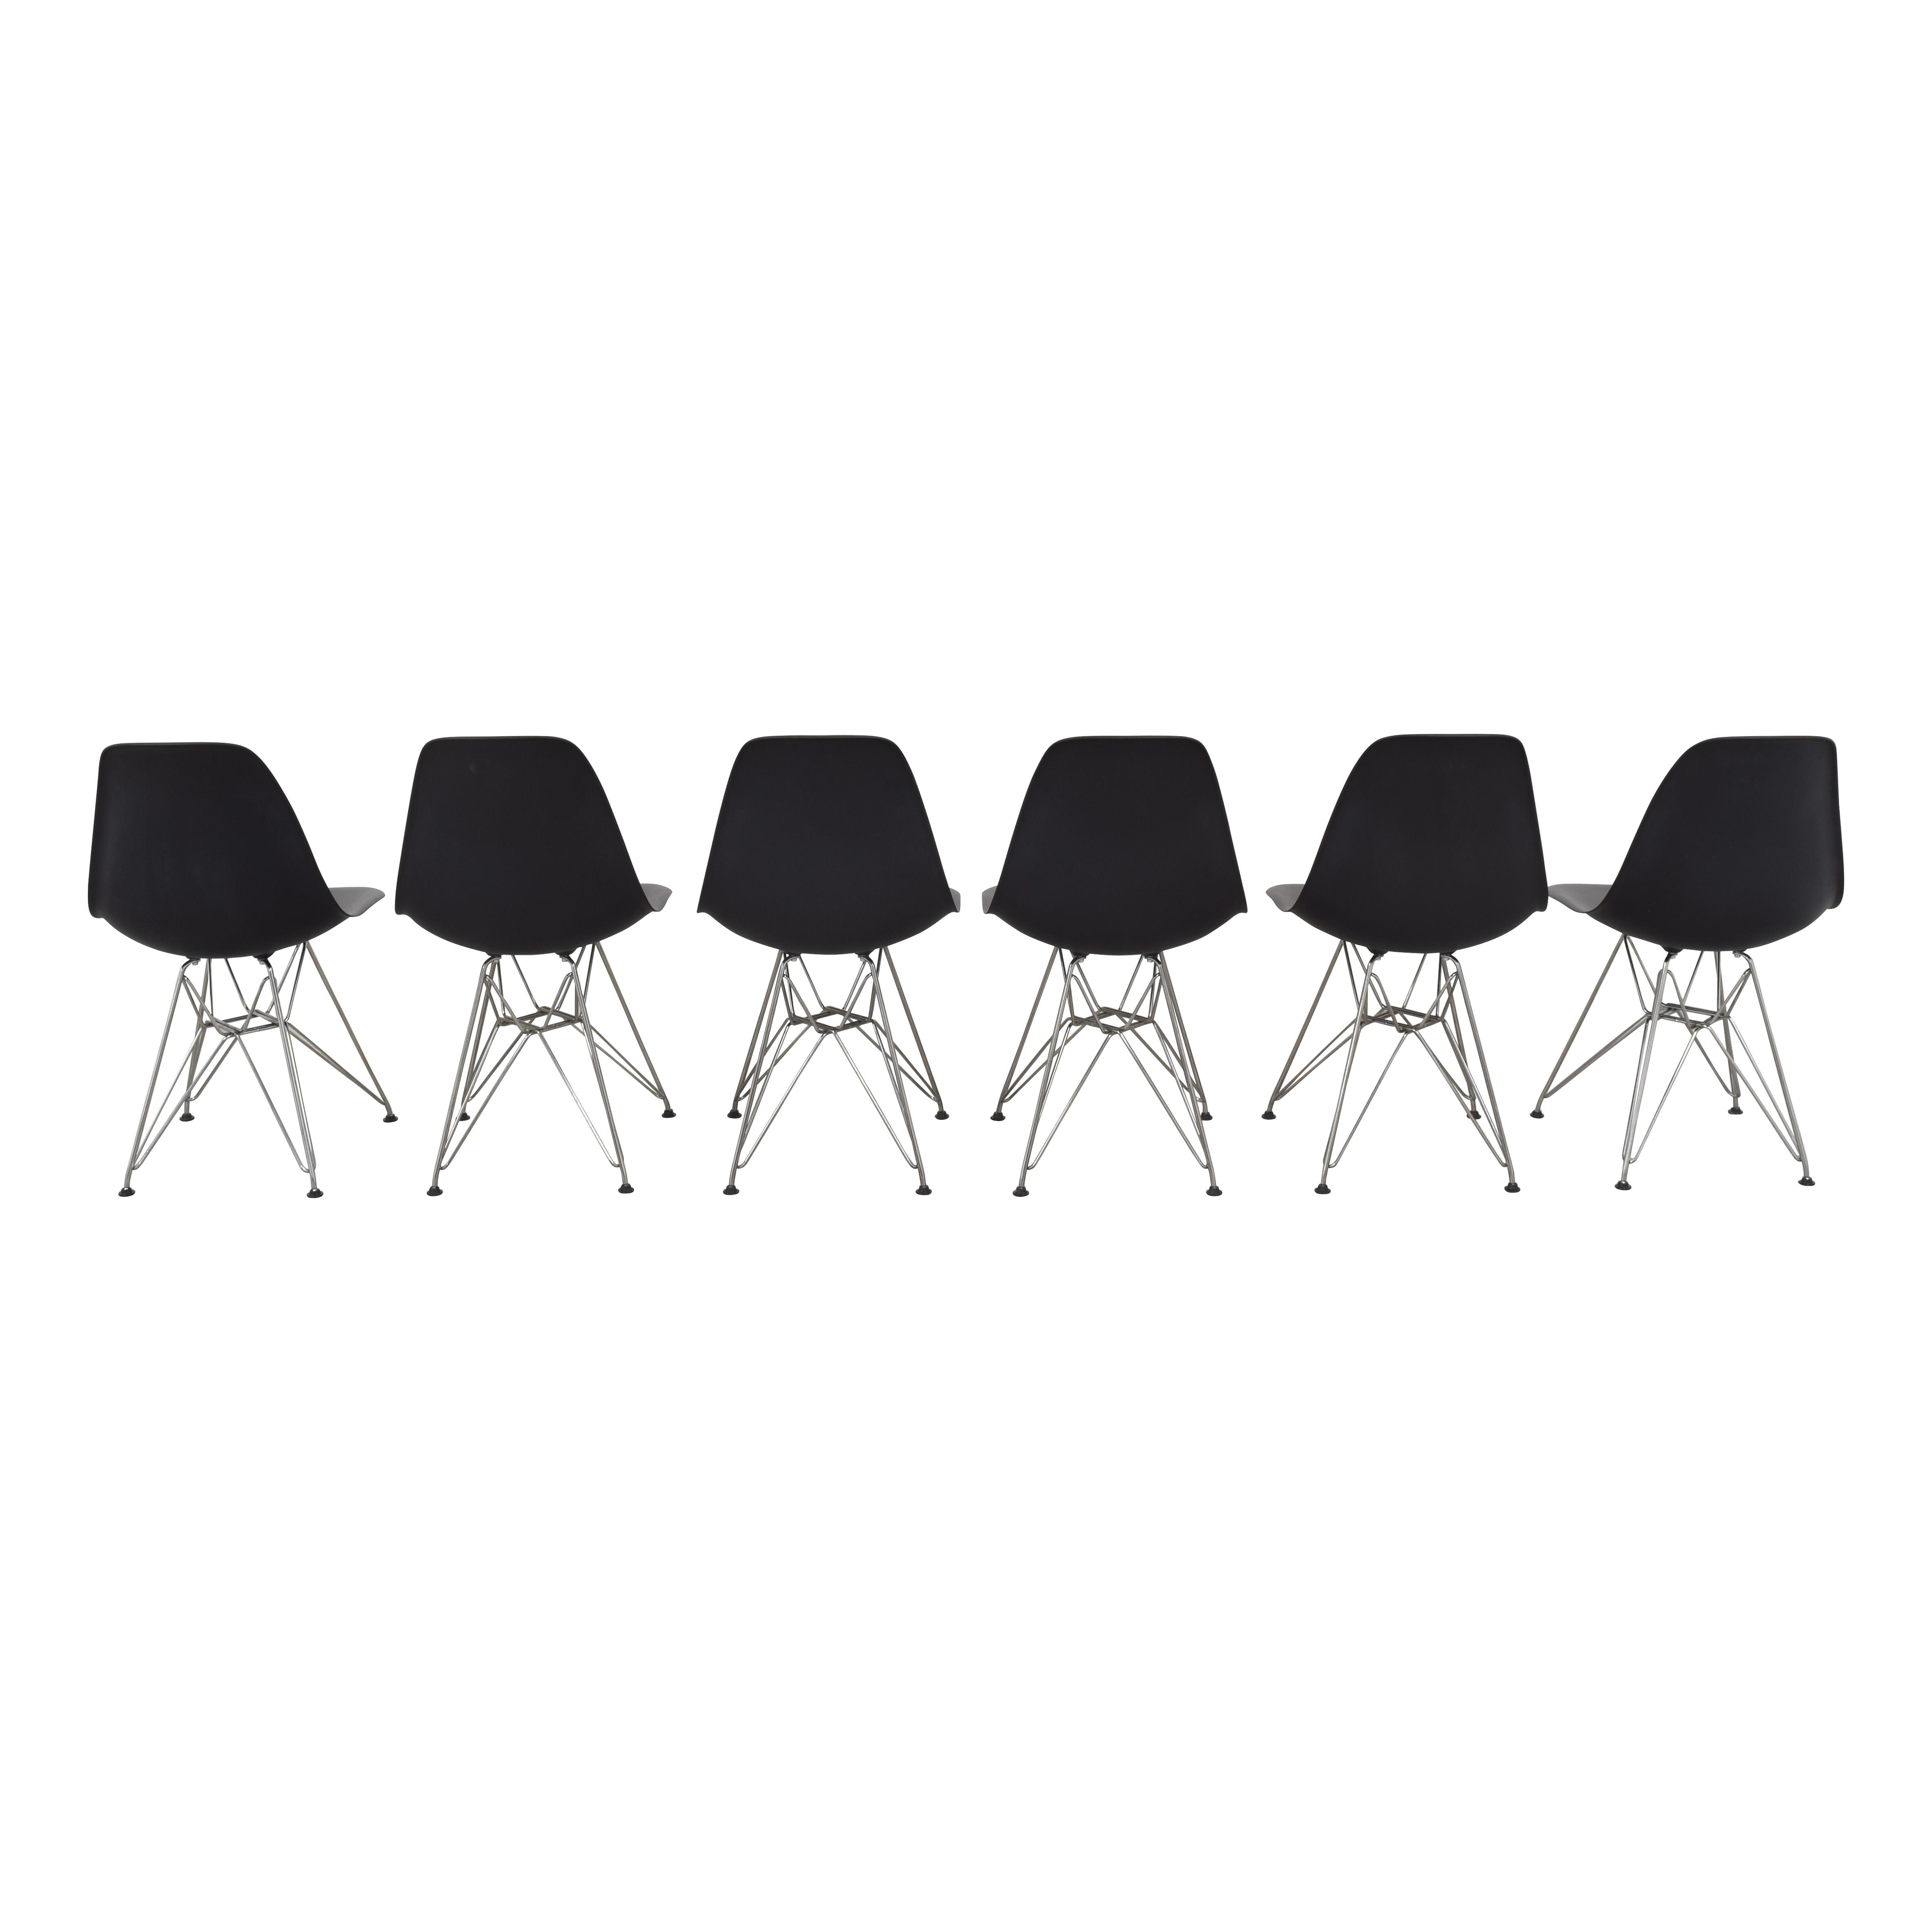 buy Herman Miller Herman Miller Eames Molded Plastic Wirebase Chairs online